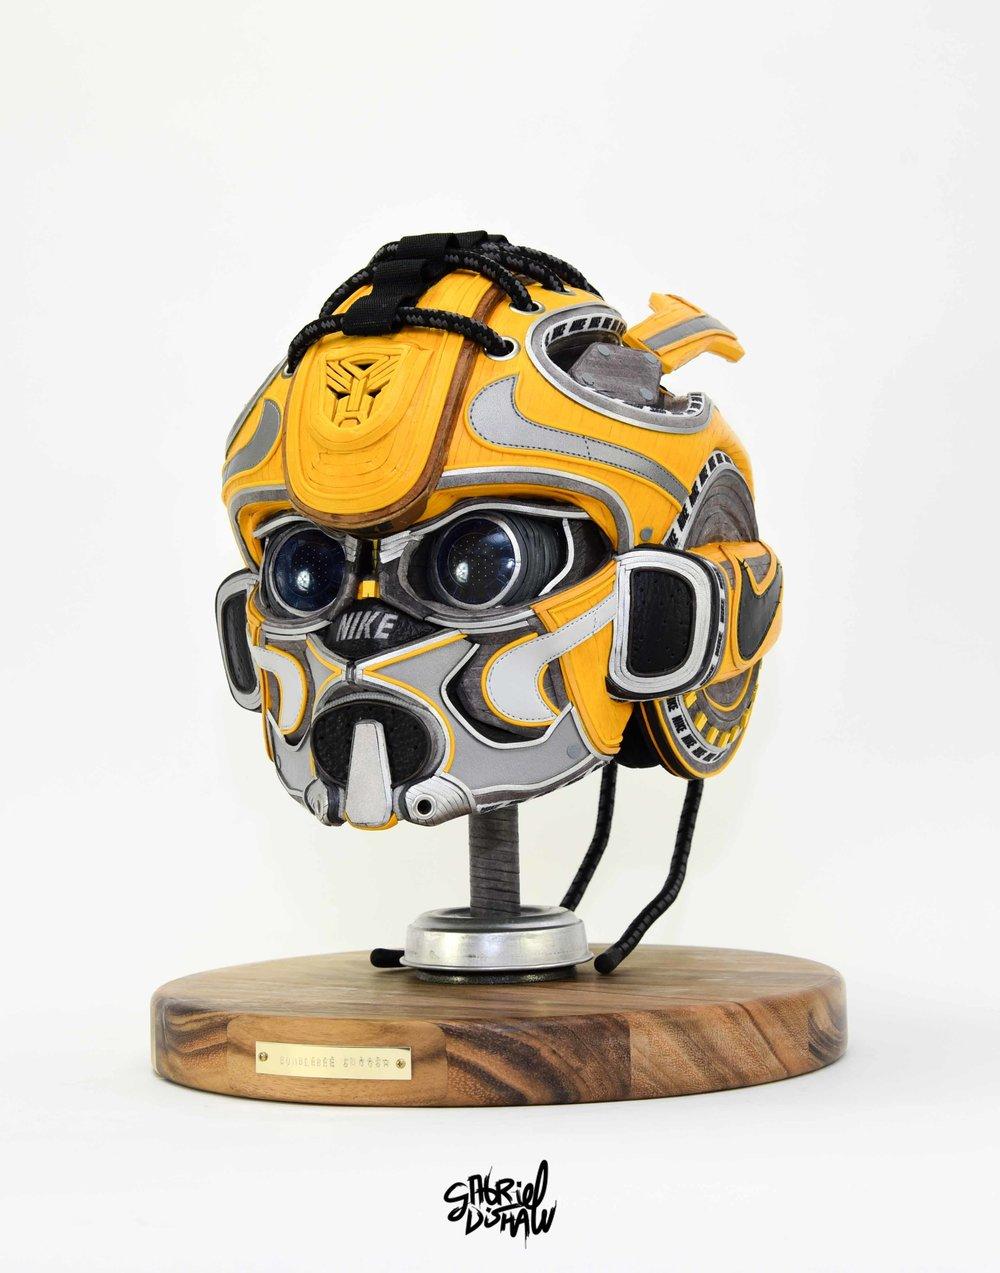 Gabriel Dishaw Bumblebee Swoosh-8630.jpg